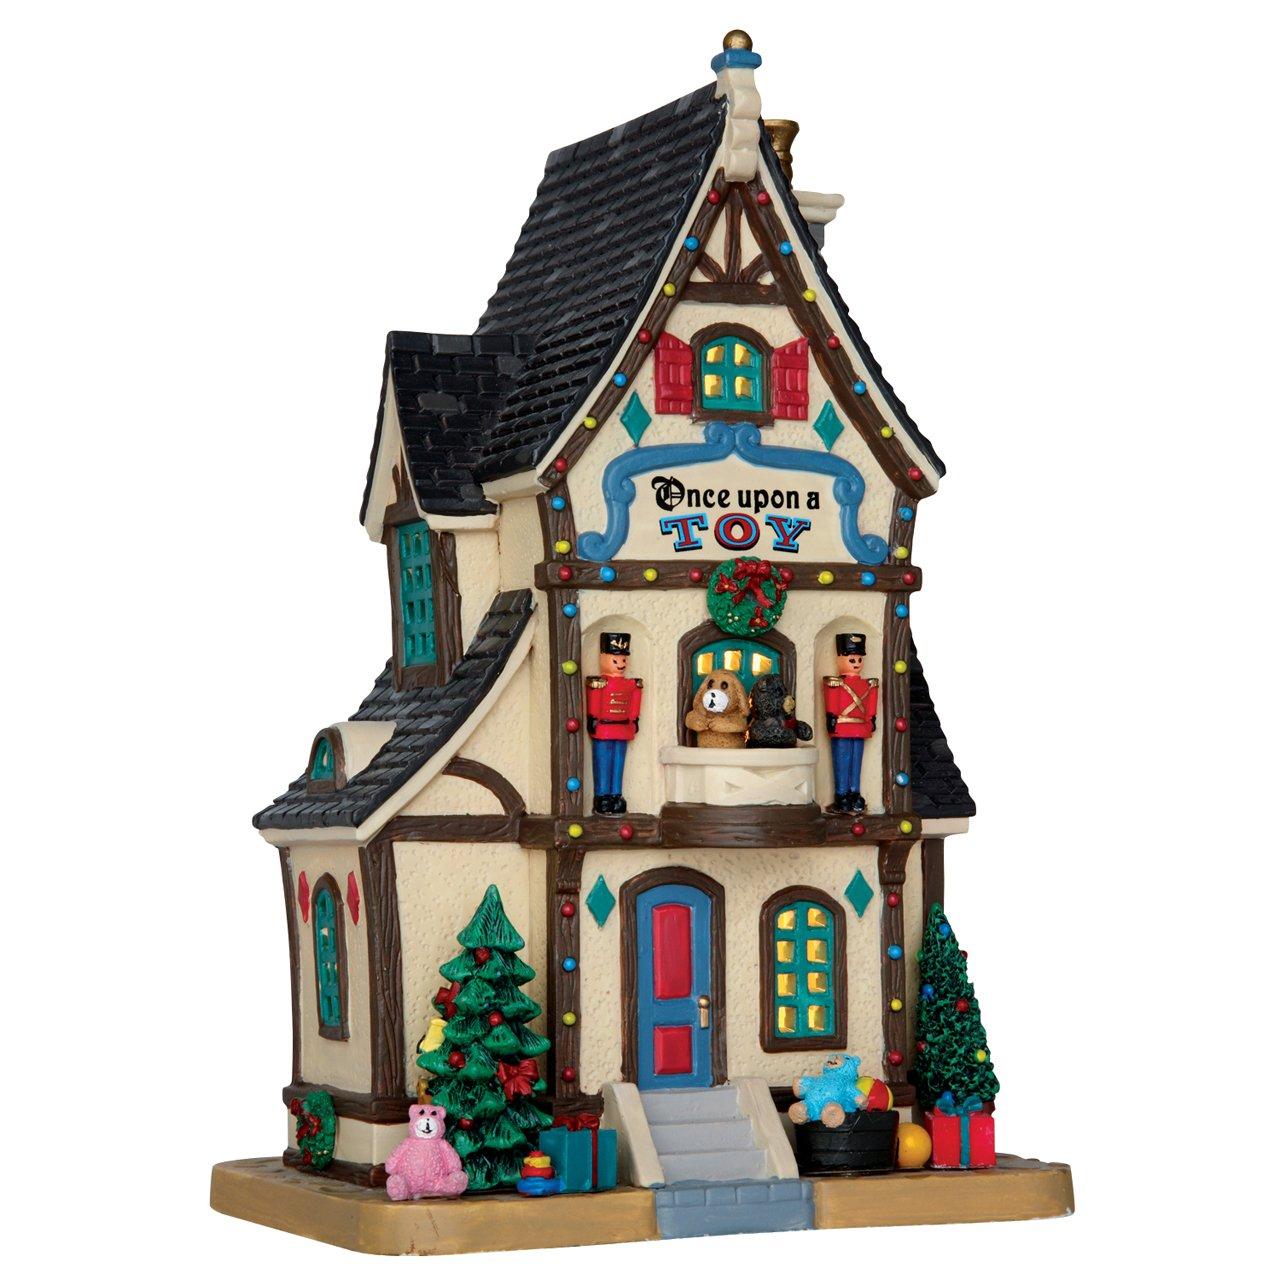 Lemax Once Upon A Toy Porcelain Village Building